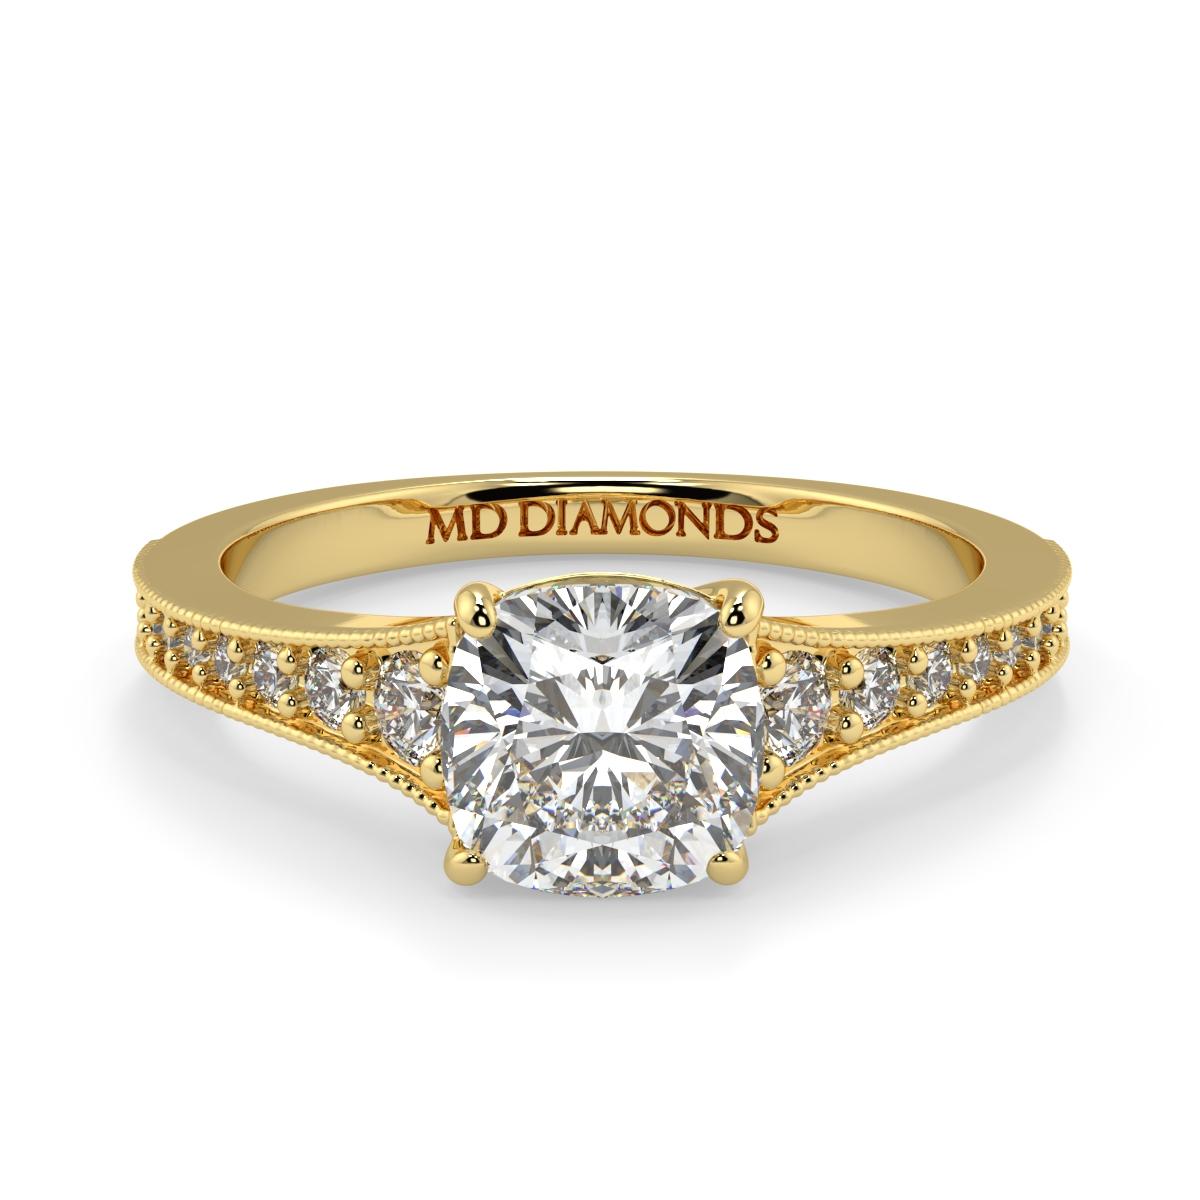 Cushion Pave Grain Set Diamond Ring